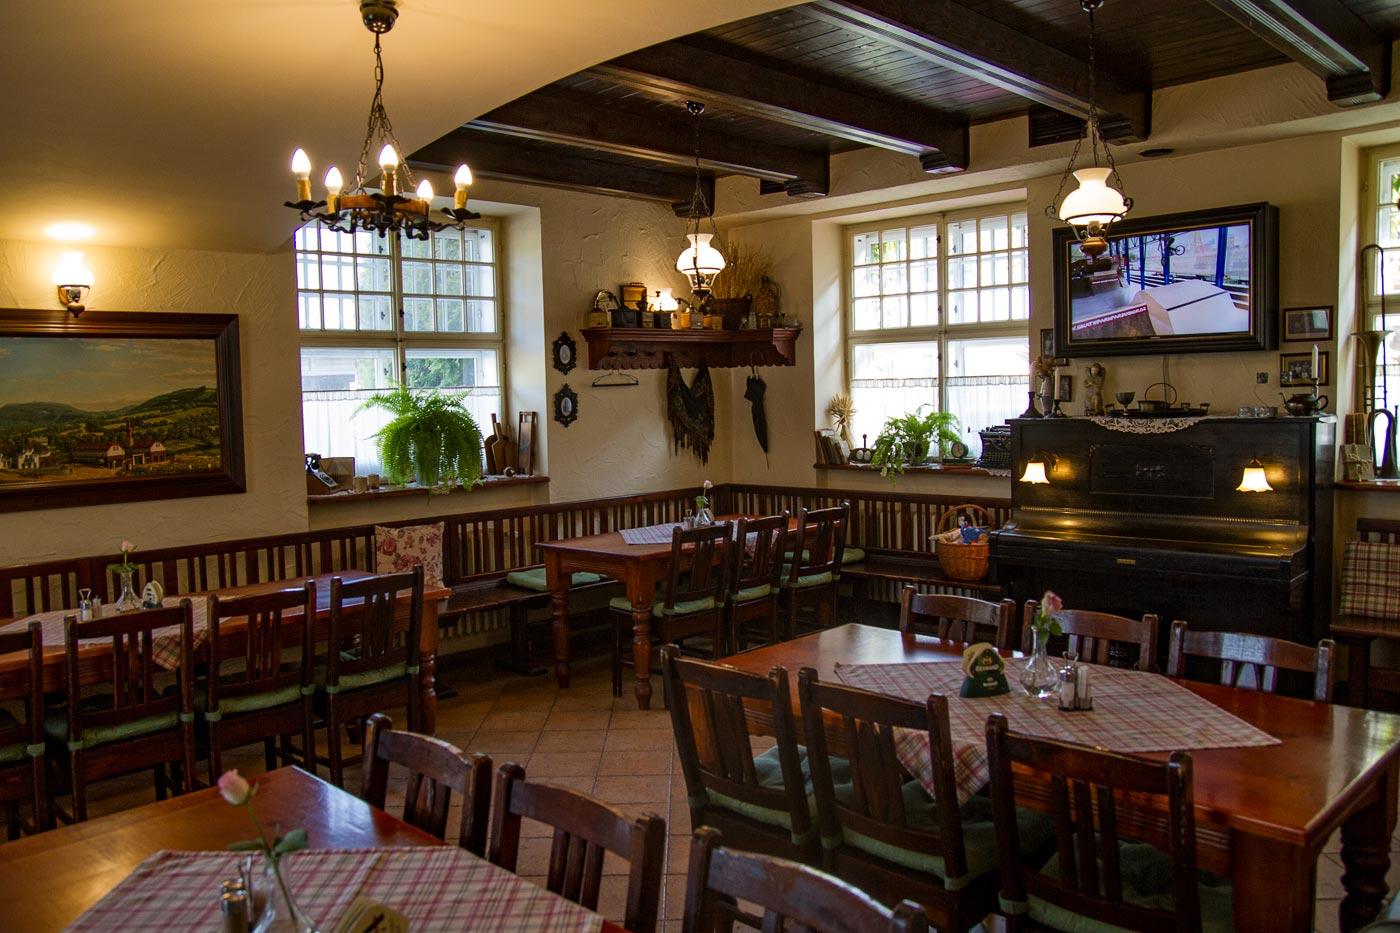 Ресторан пансиона Брусенка в Моравии